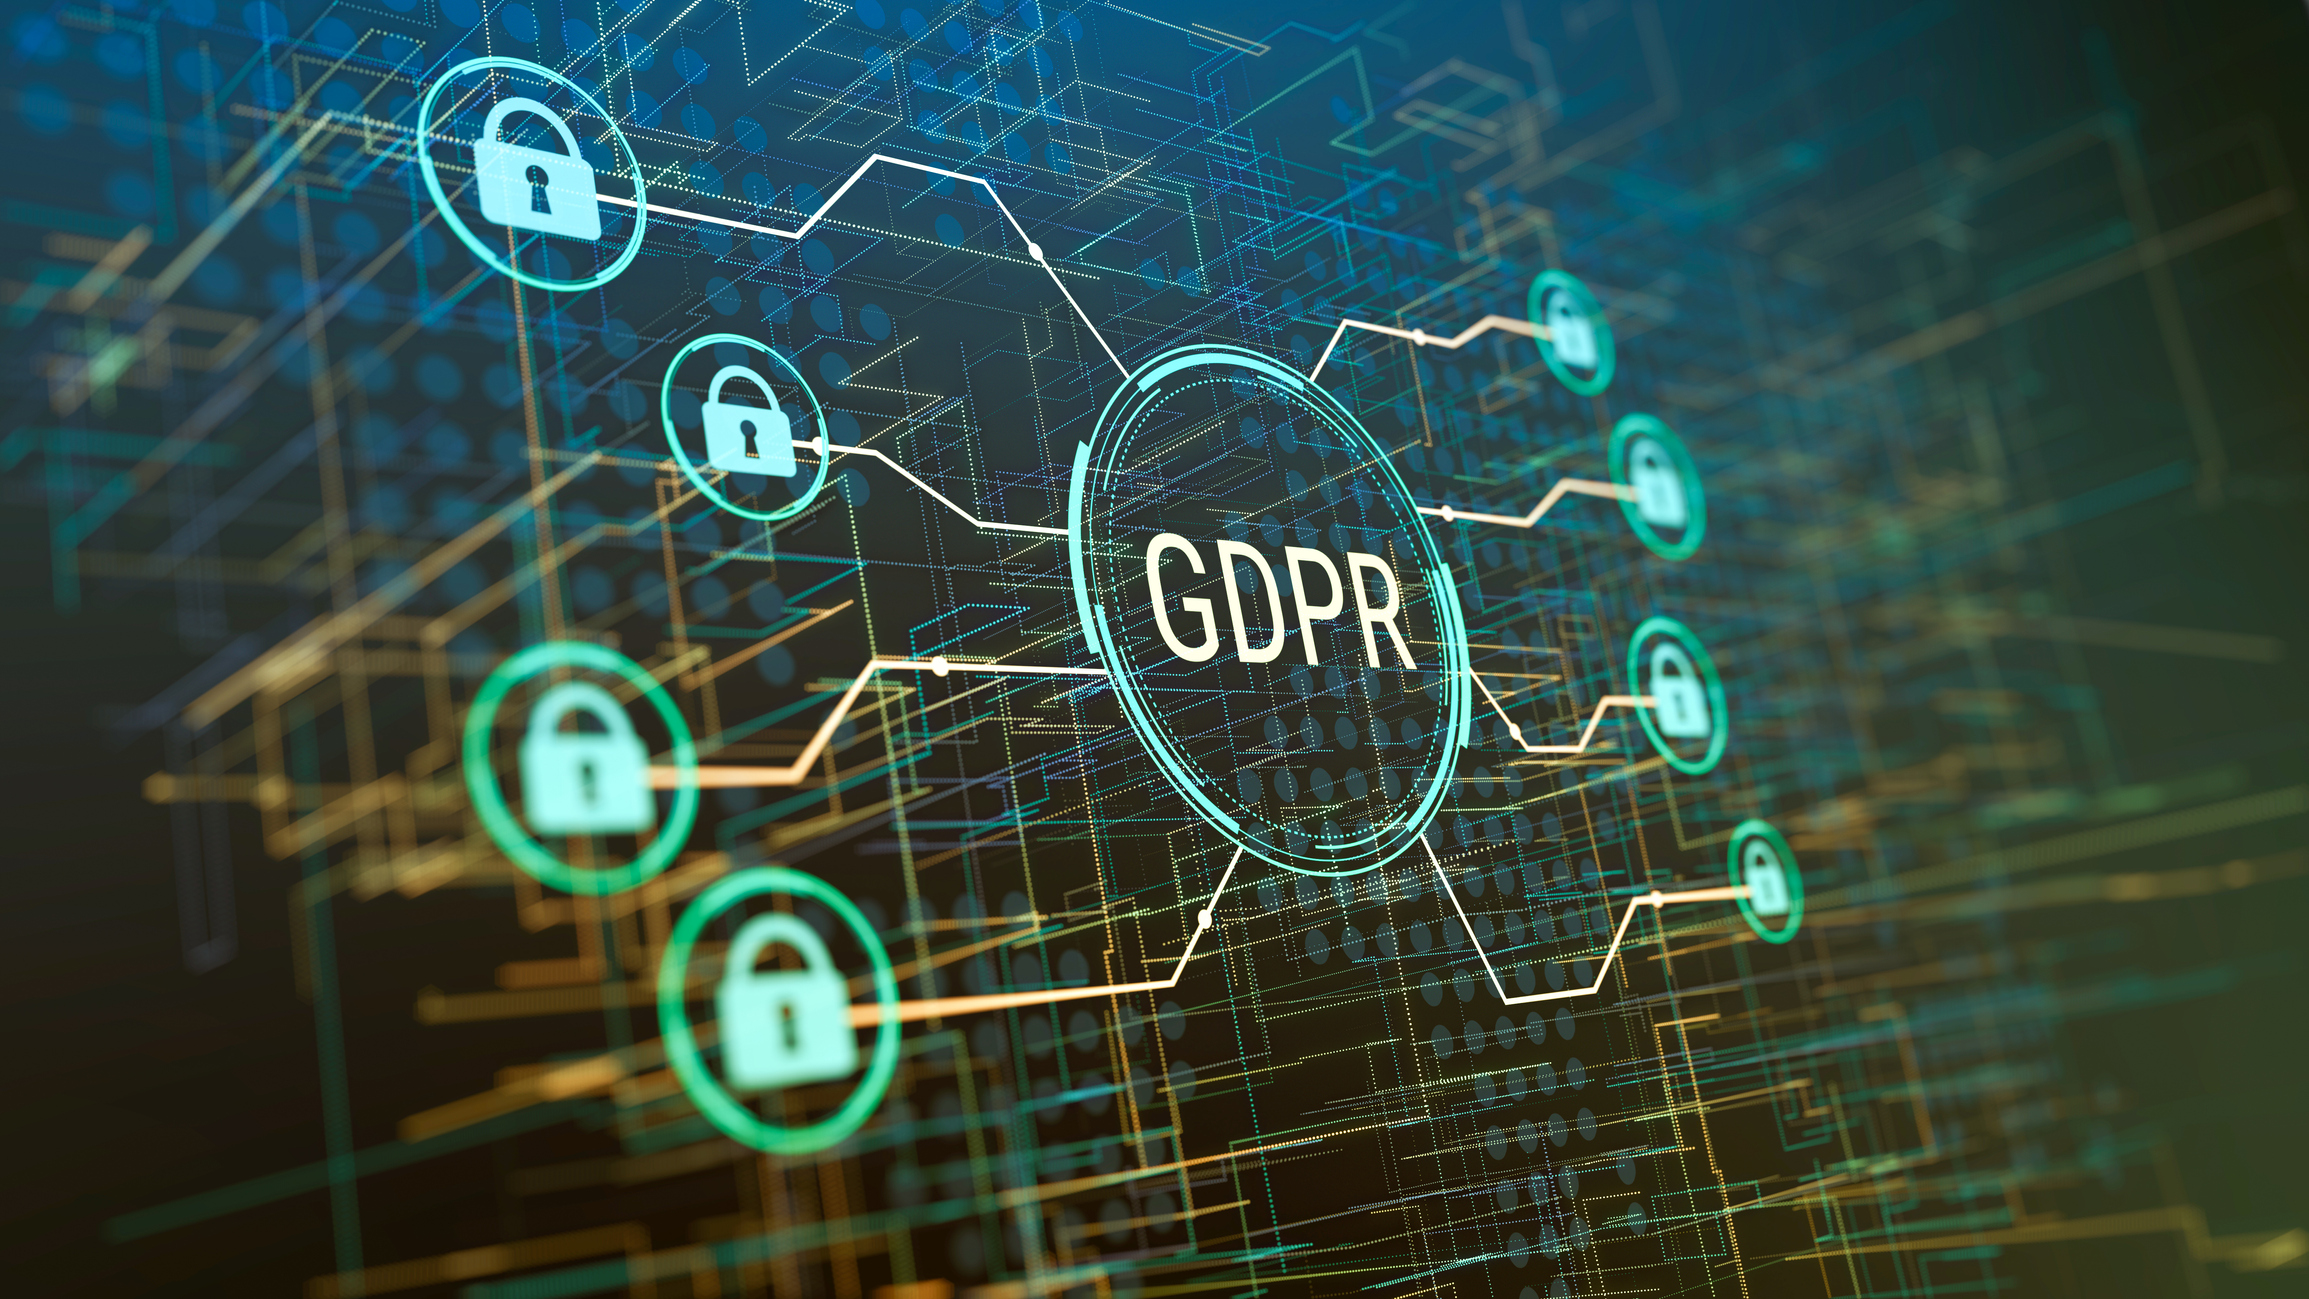 Alpine Security's GDPR Awareness Training